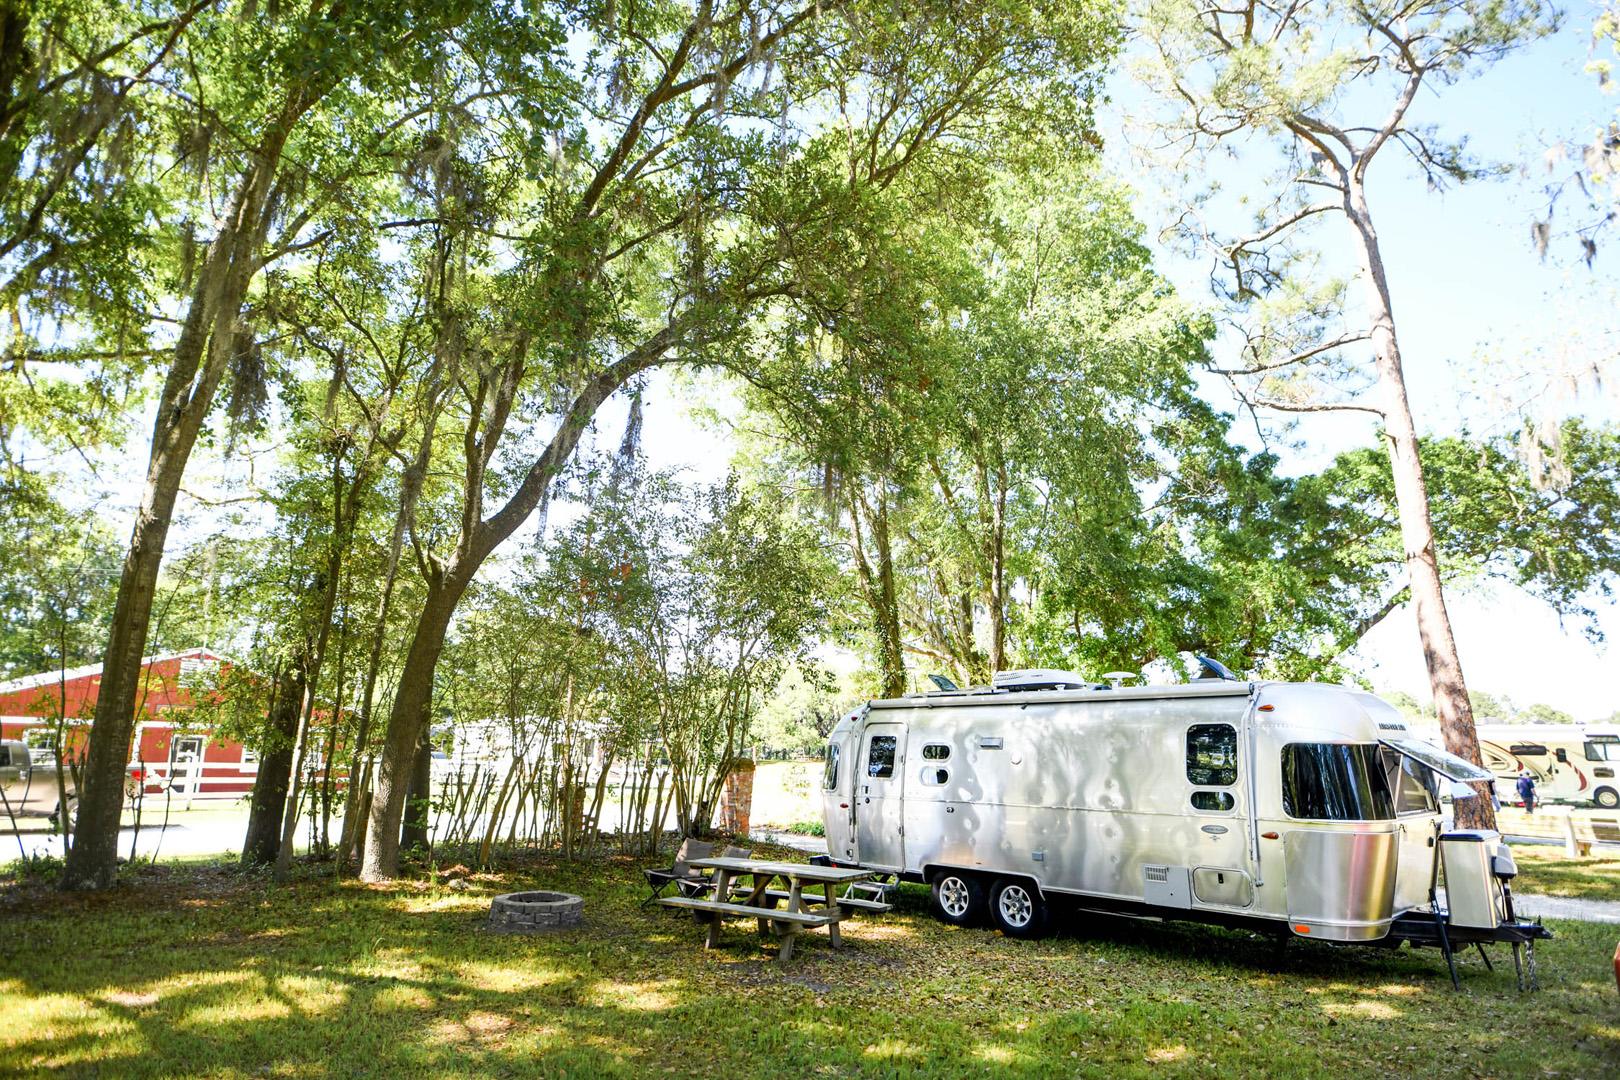 Airstream Travel Trailer RV Camper Trailer Set up at Campsite